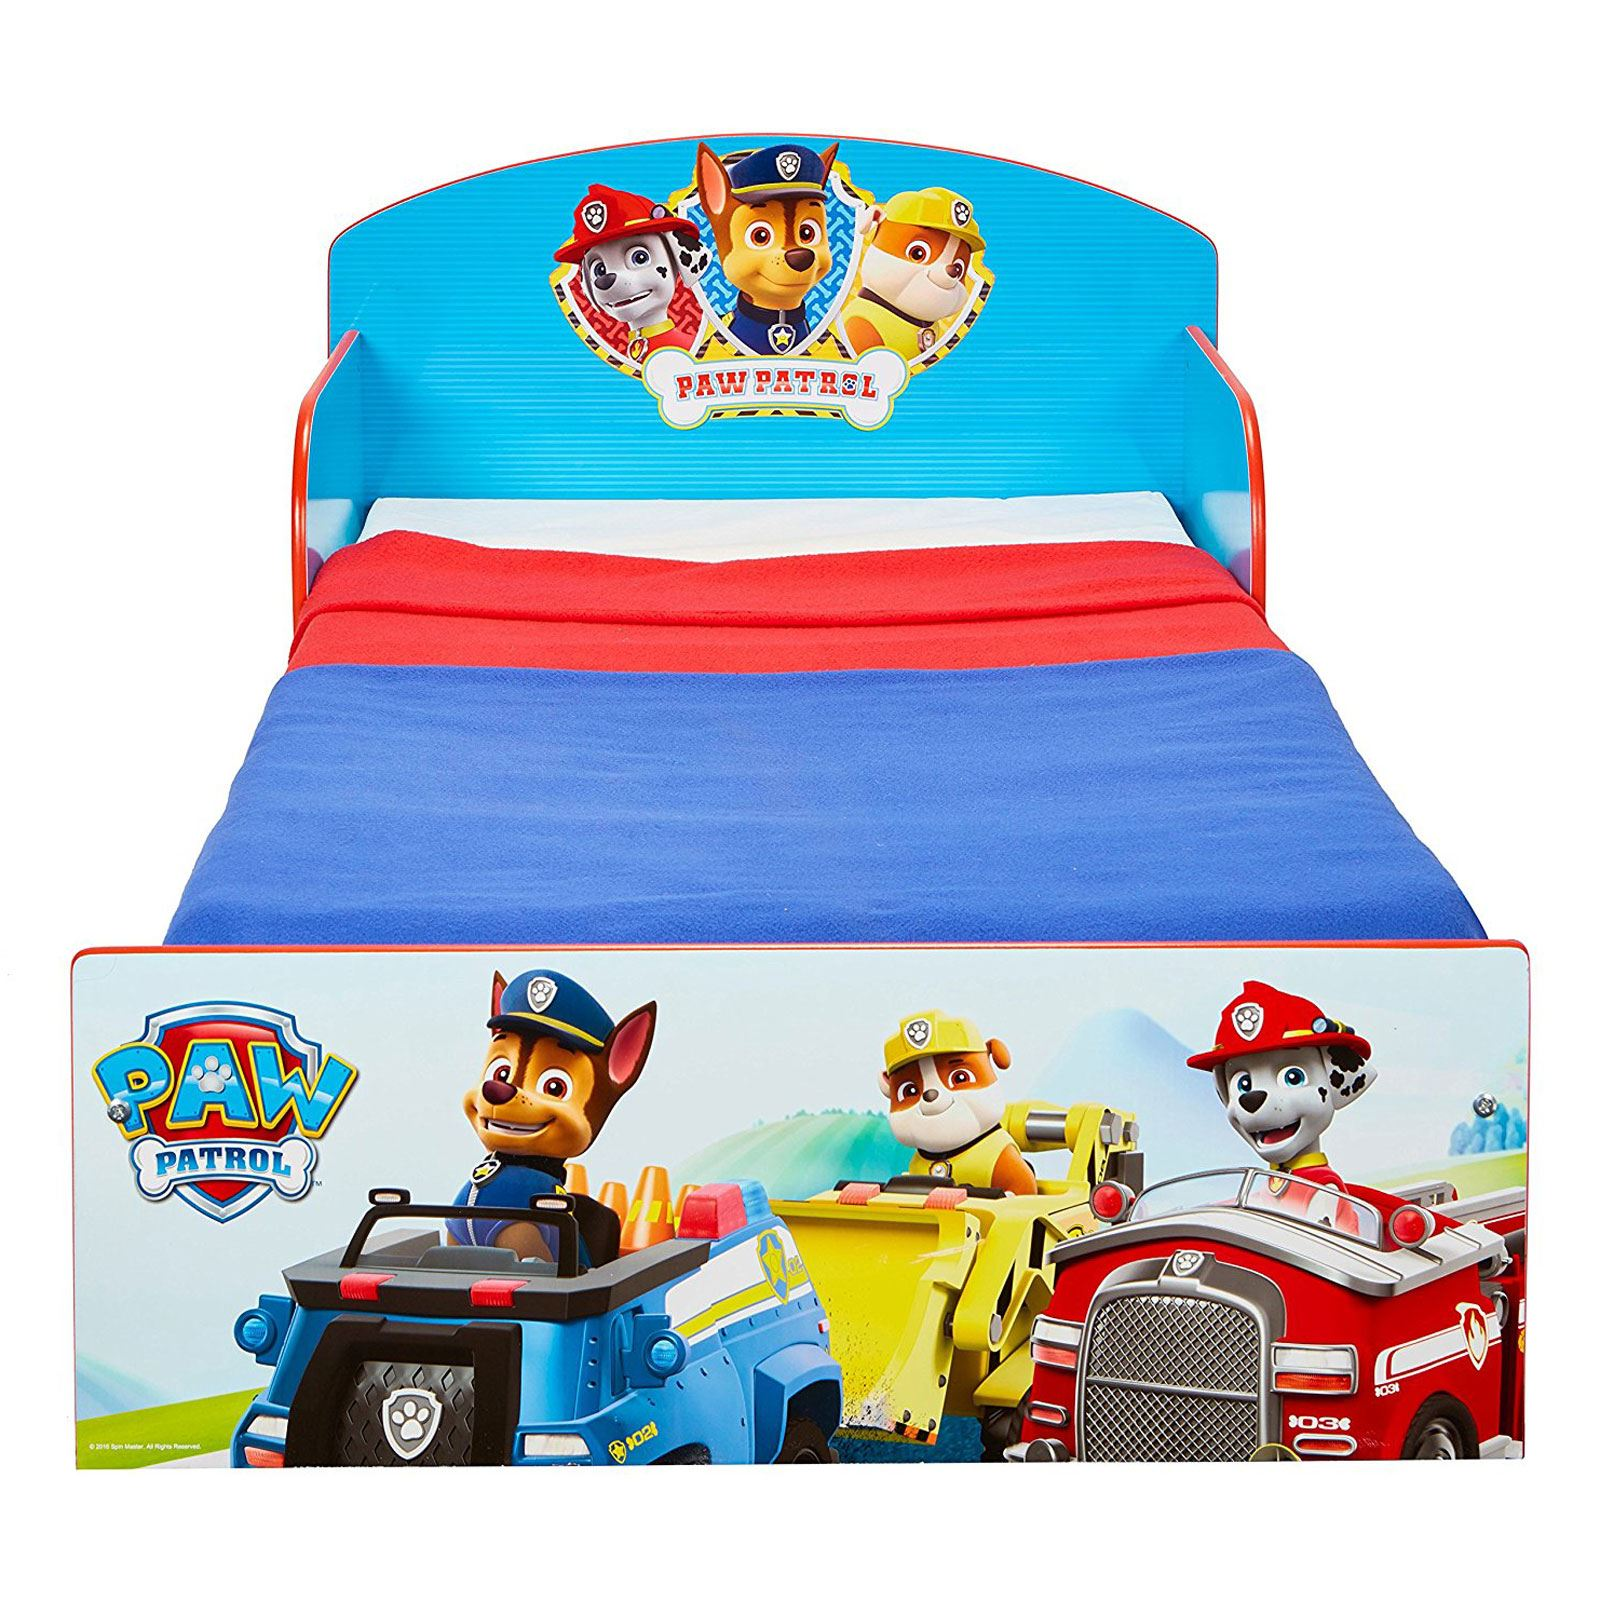 miniatura 31 - KIDS CHARACTER TODDLER BEDS - BOYS GIRLS BEDROOM DISNEY